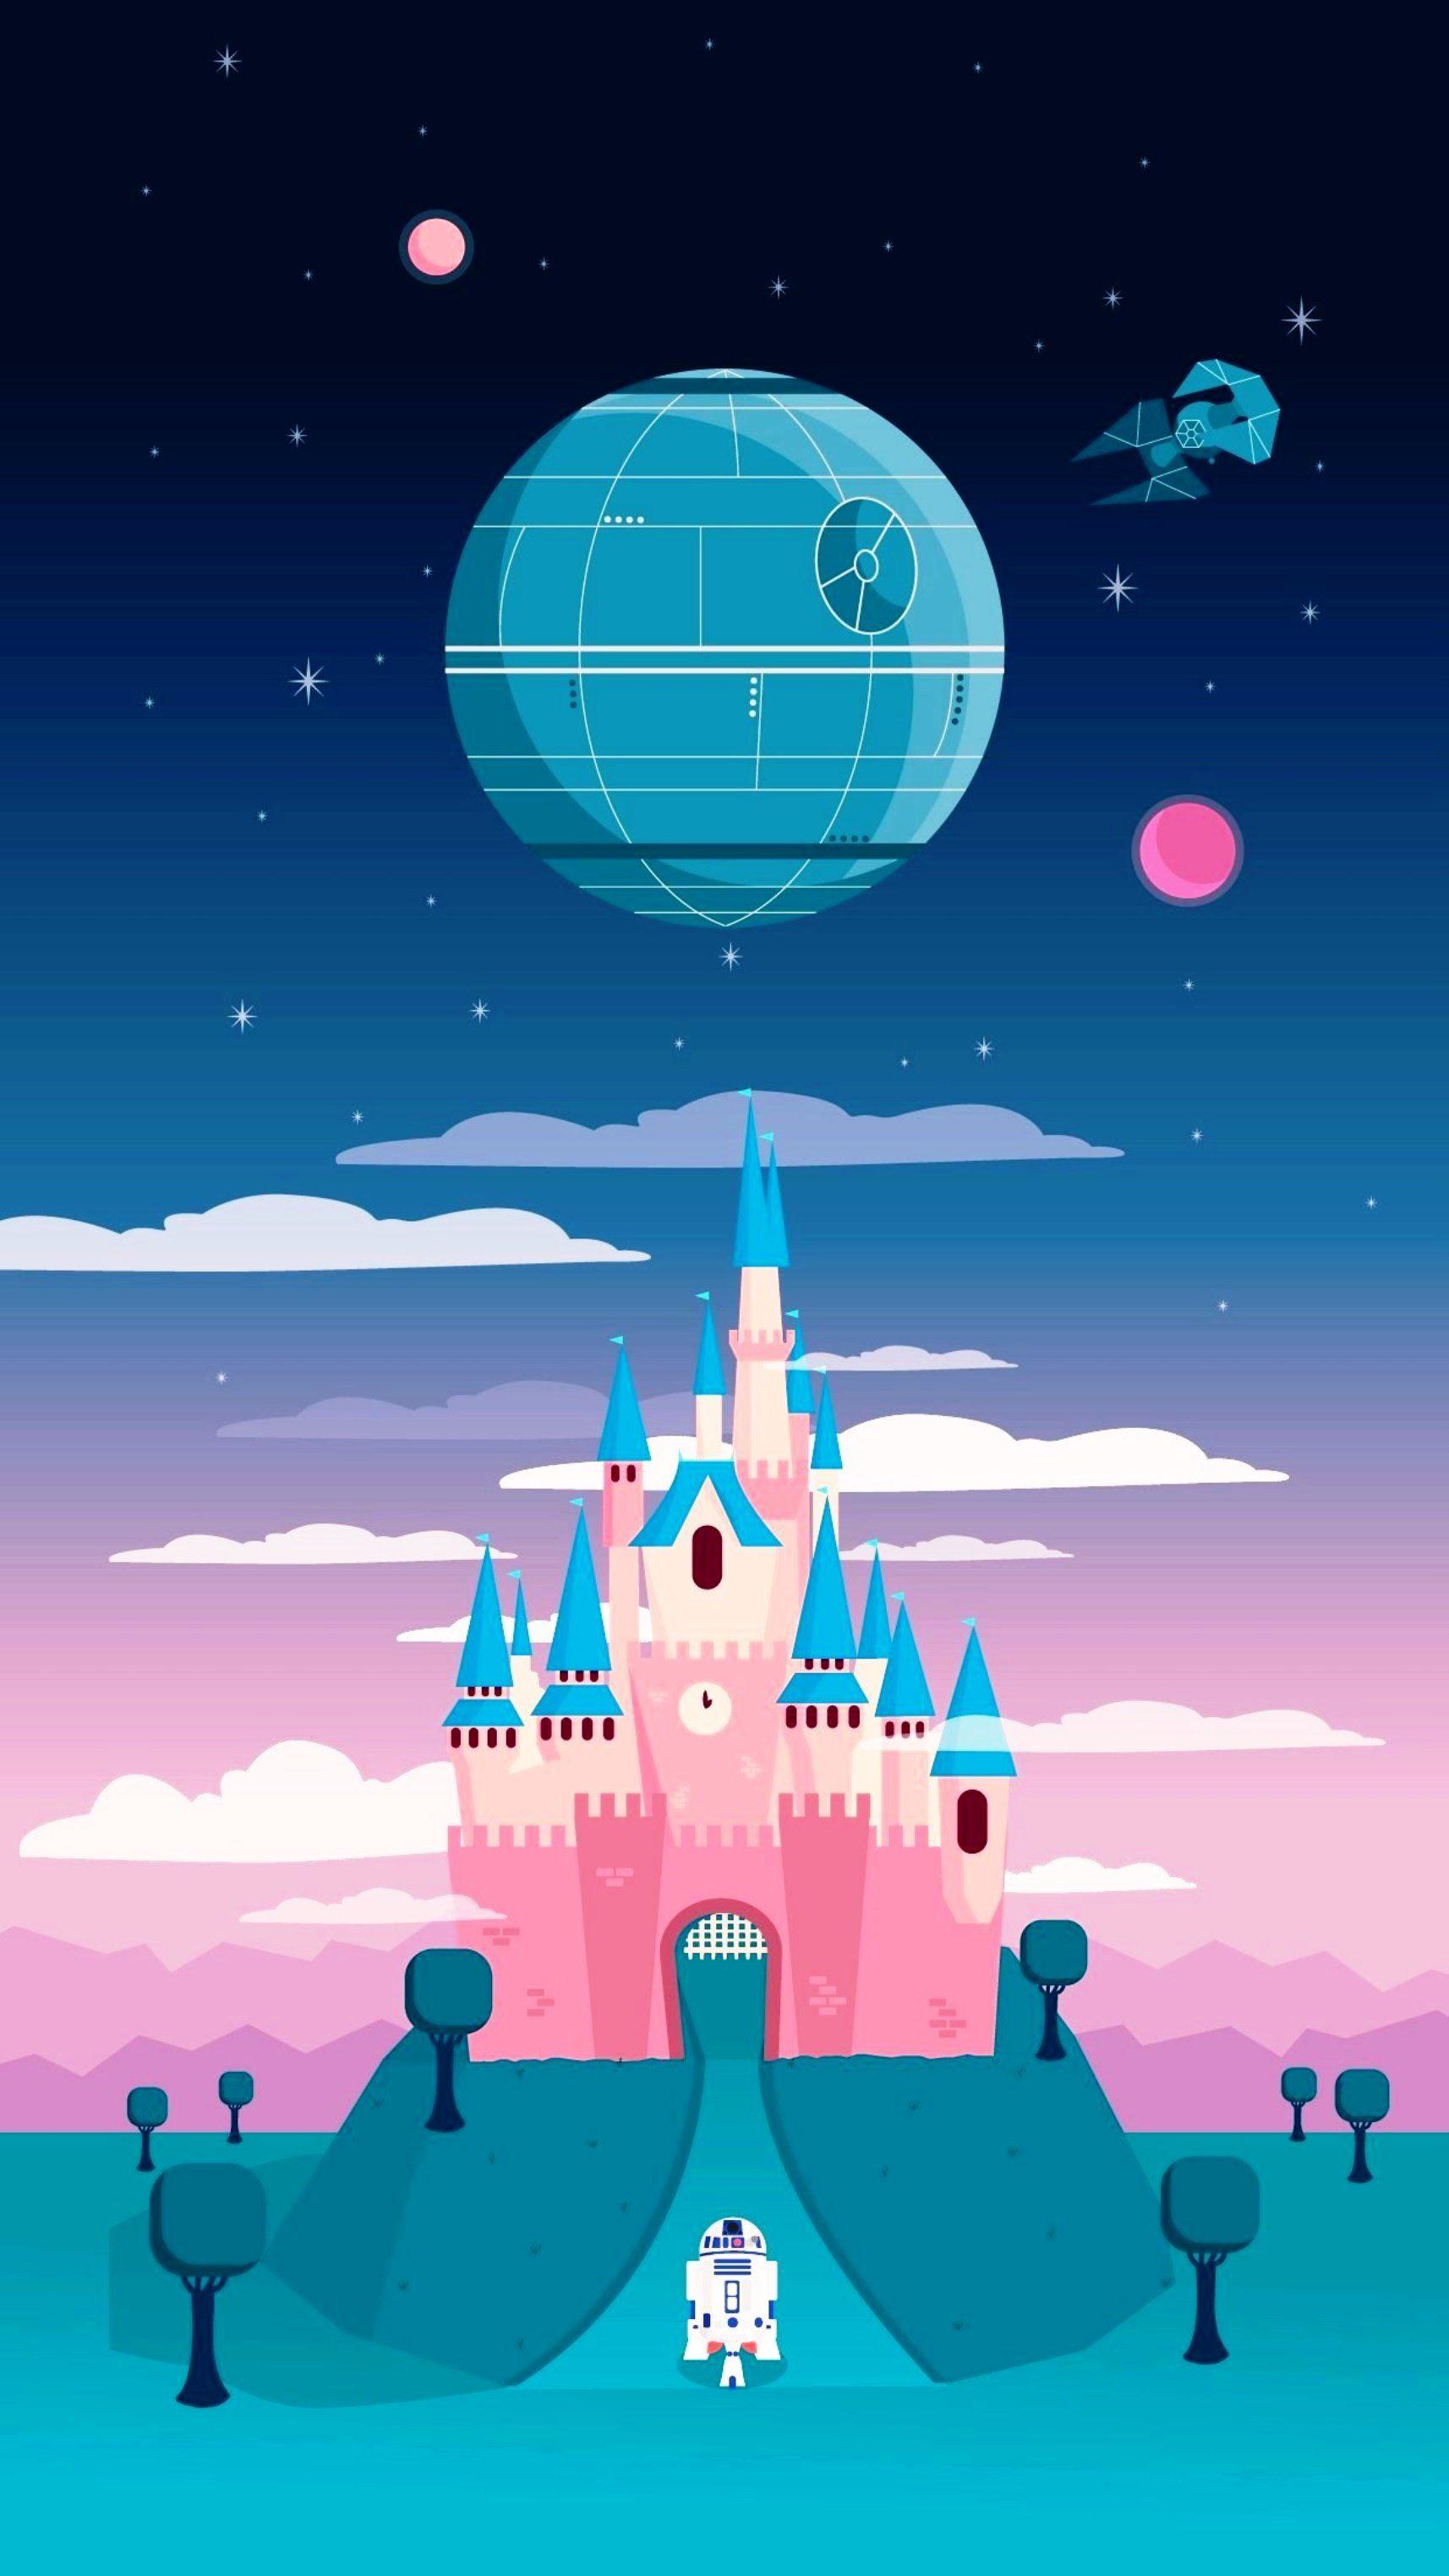 Cute Disney Wallpaper Wallpaper Iphone Disney Star Wars Wallpaper Disney Phone Wallpaper